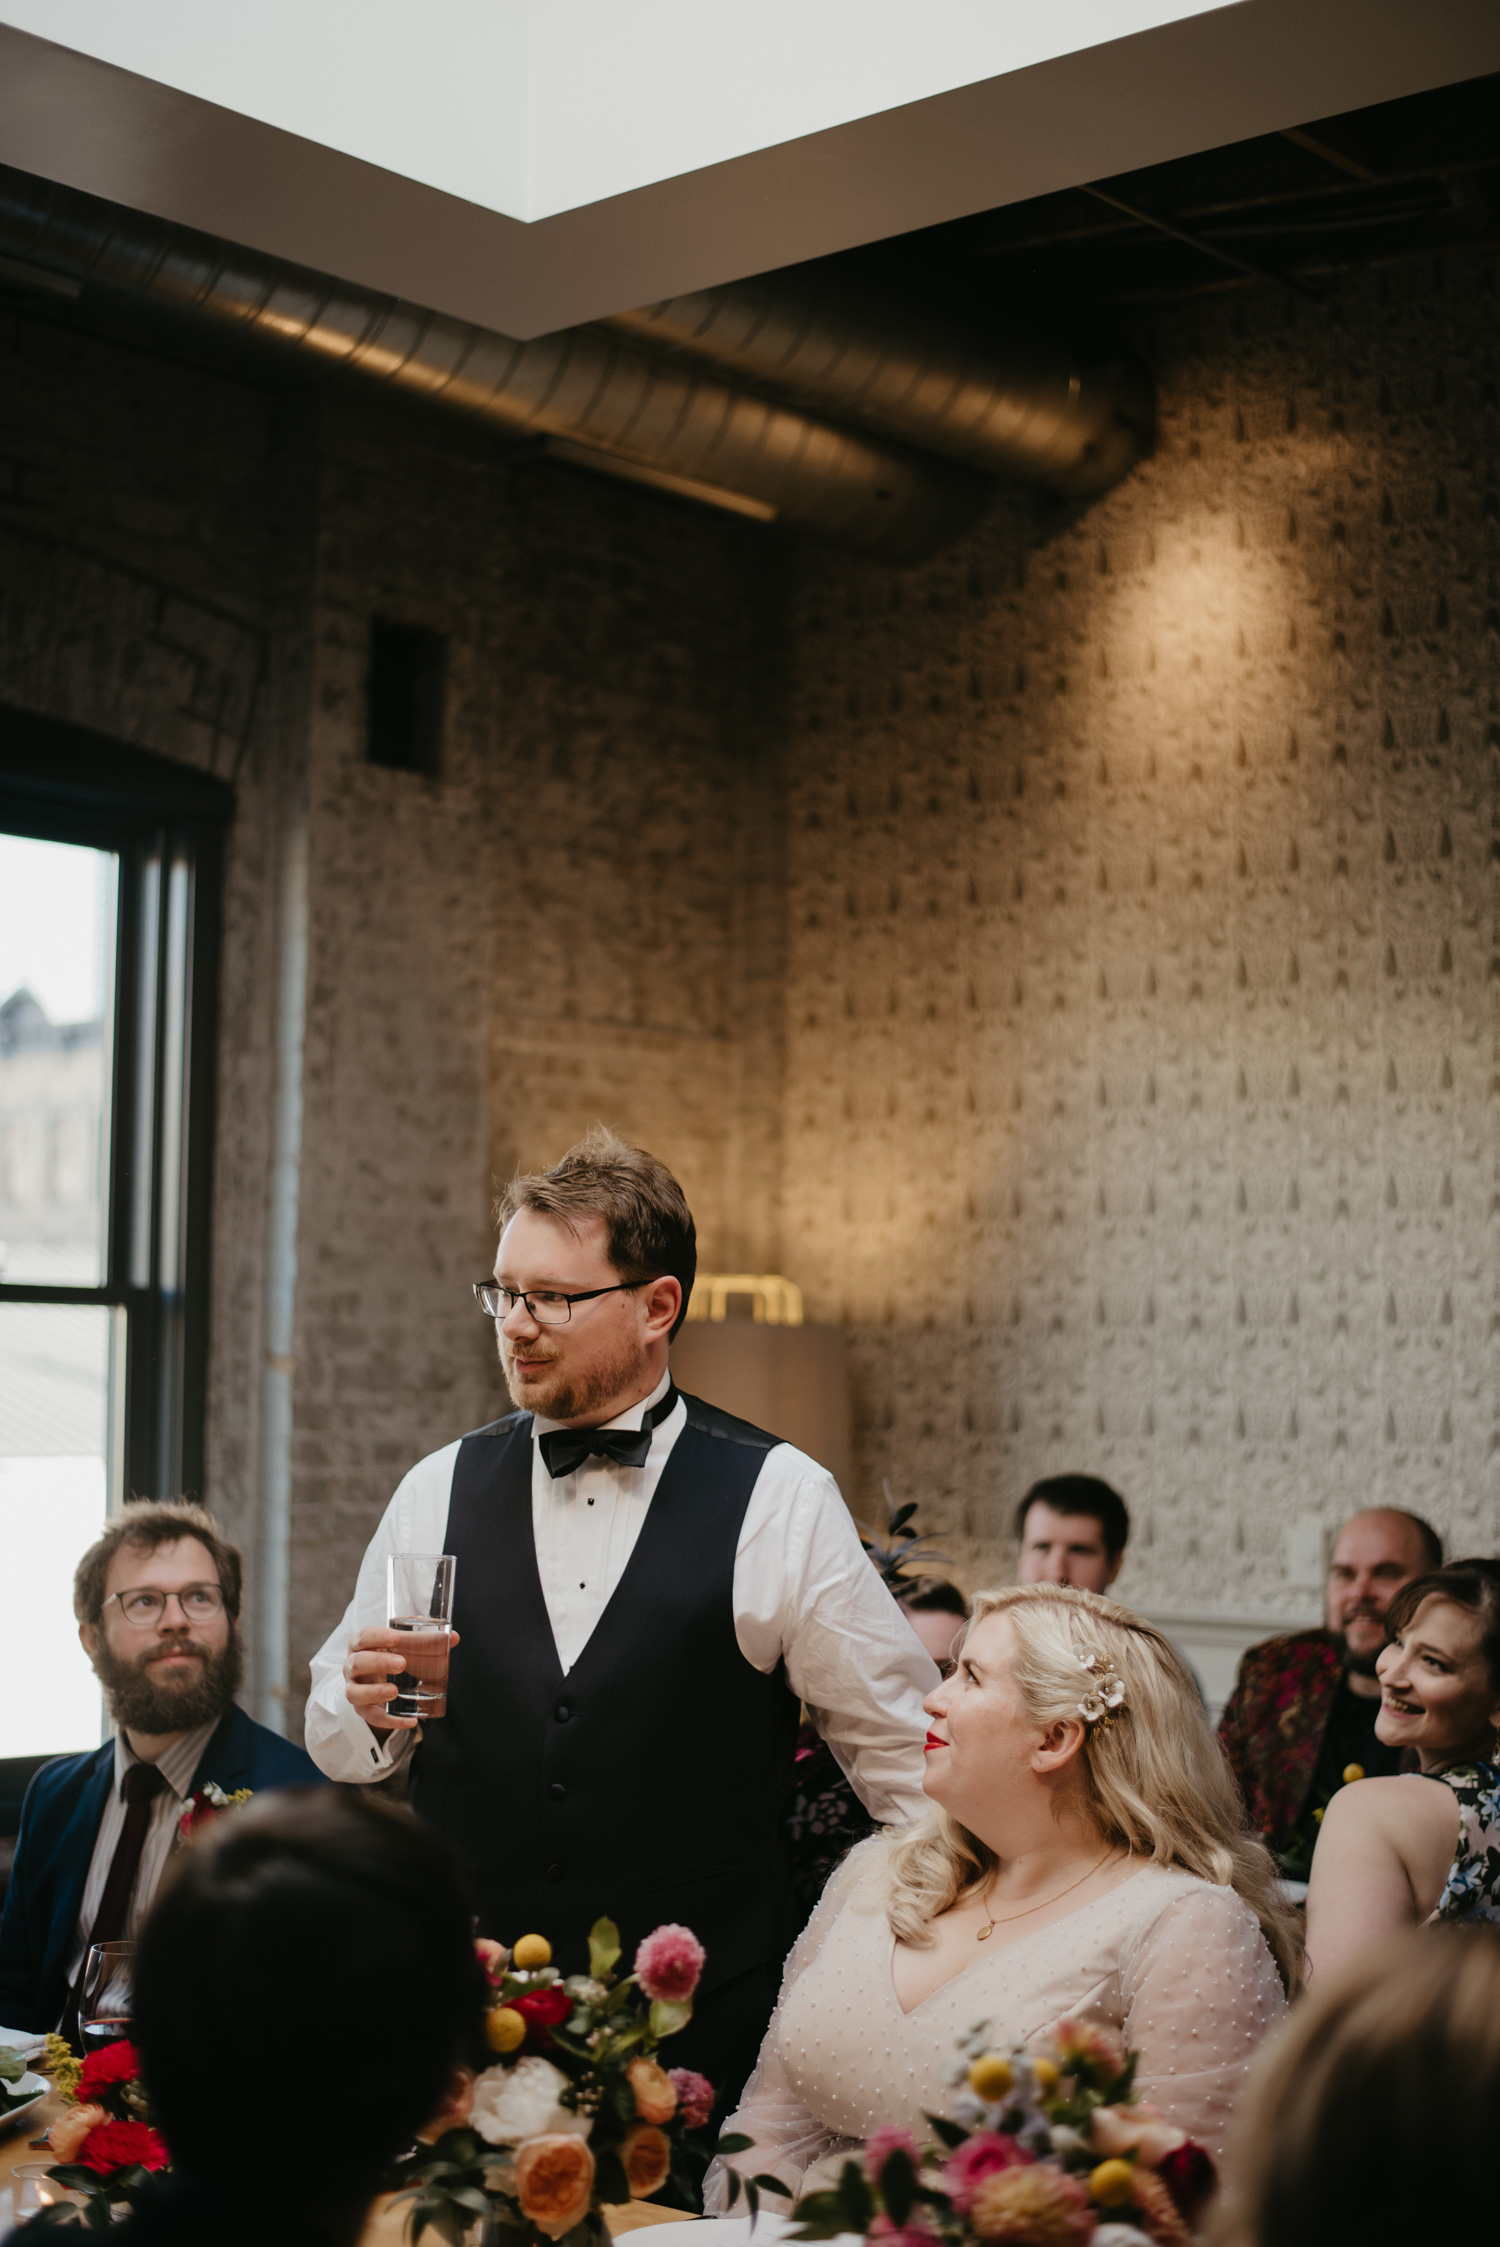 235-Bachelor_Farmer_Minneapolis_Wedding.jpg